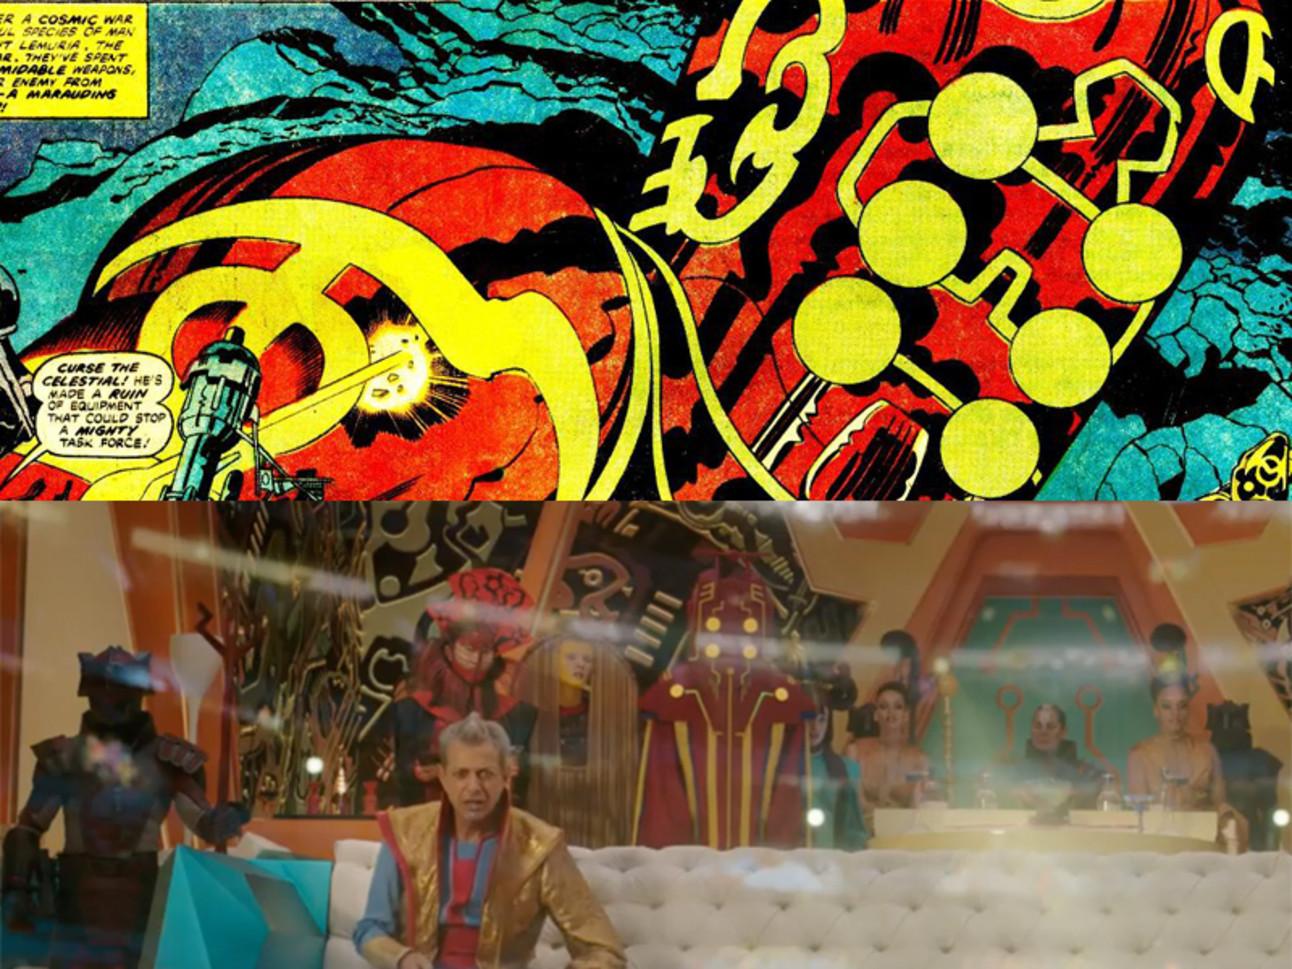 11-kirby-celestials-comics-thor-ragnaraok.jpg